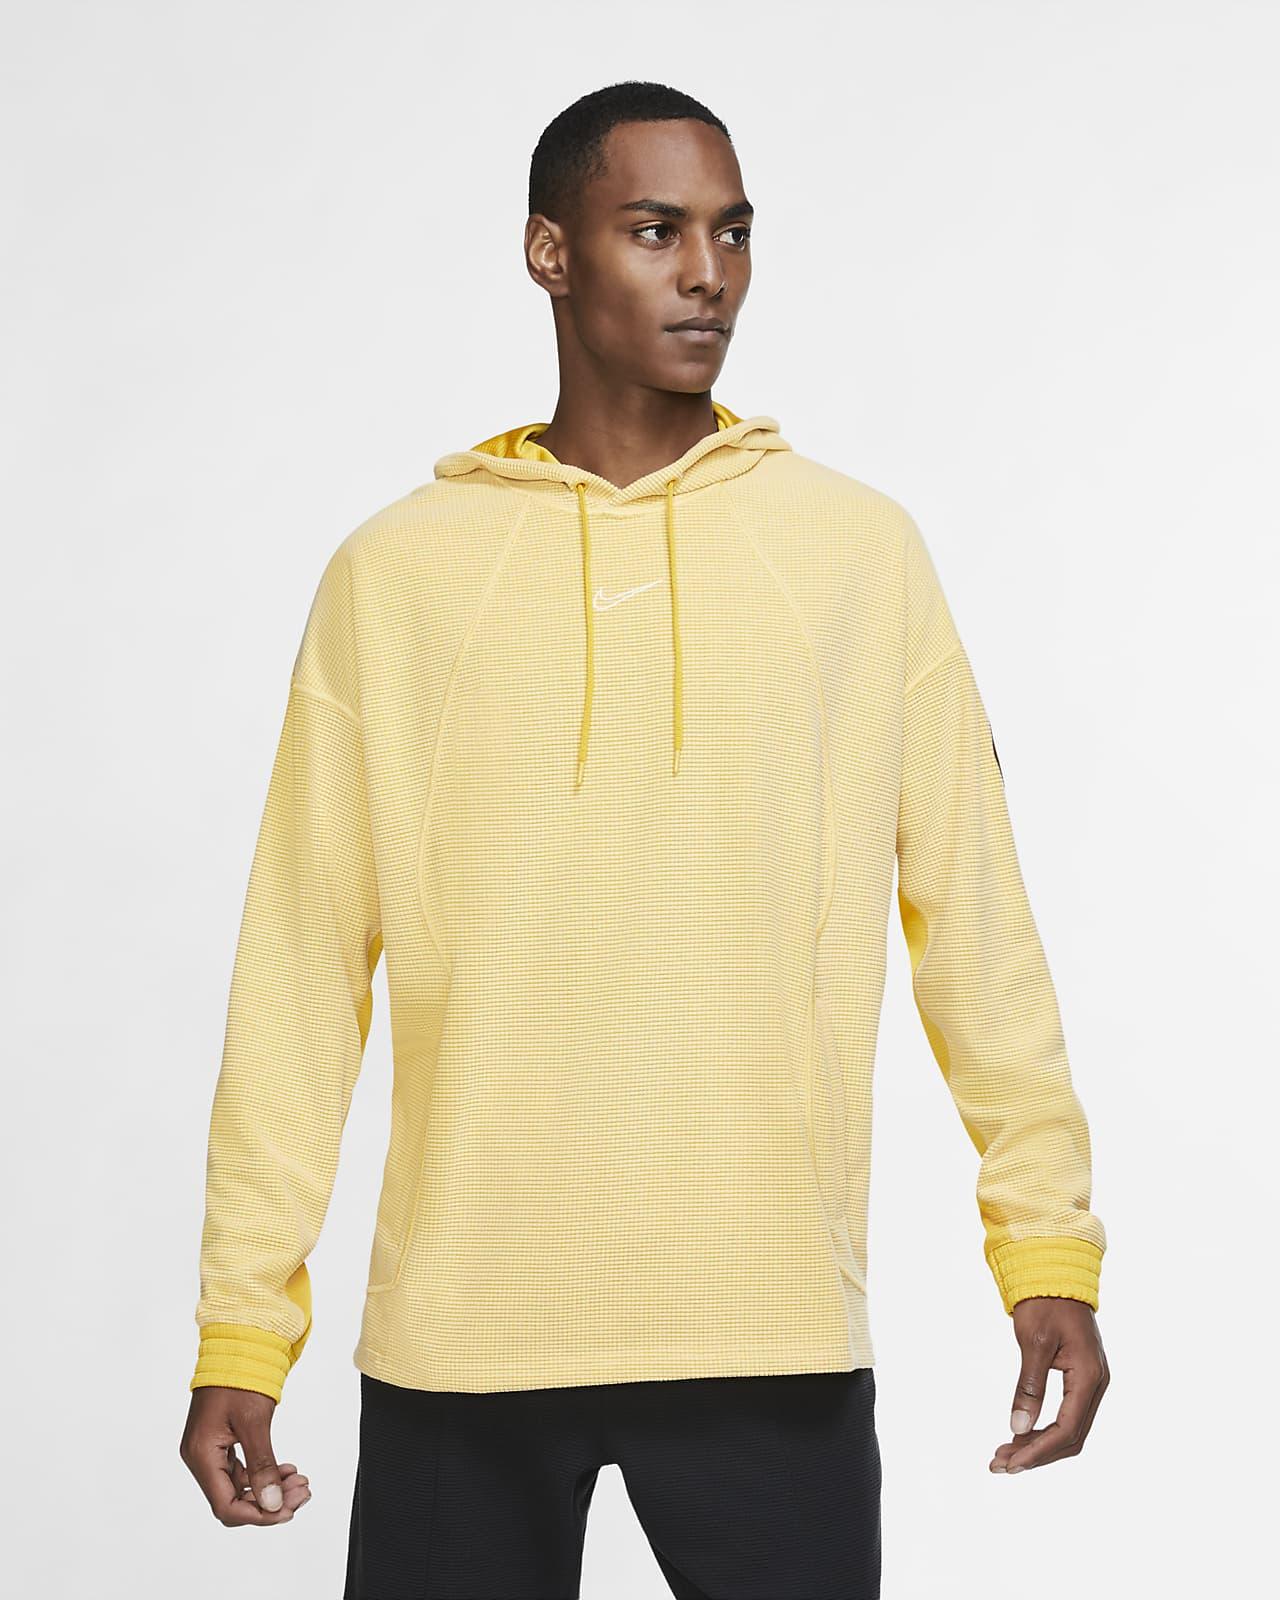 Nike Fleece-Trainings-Hoodie für Herren